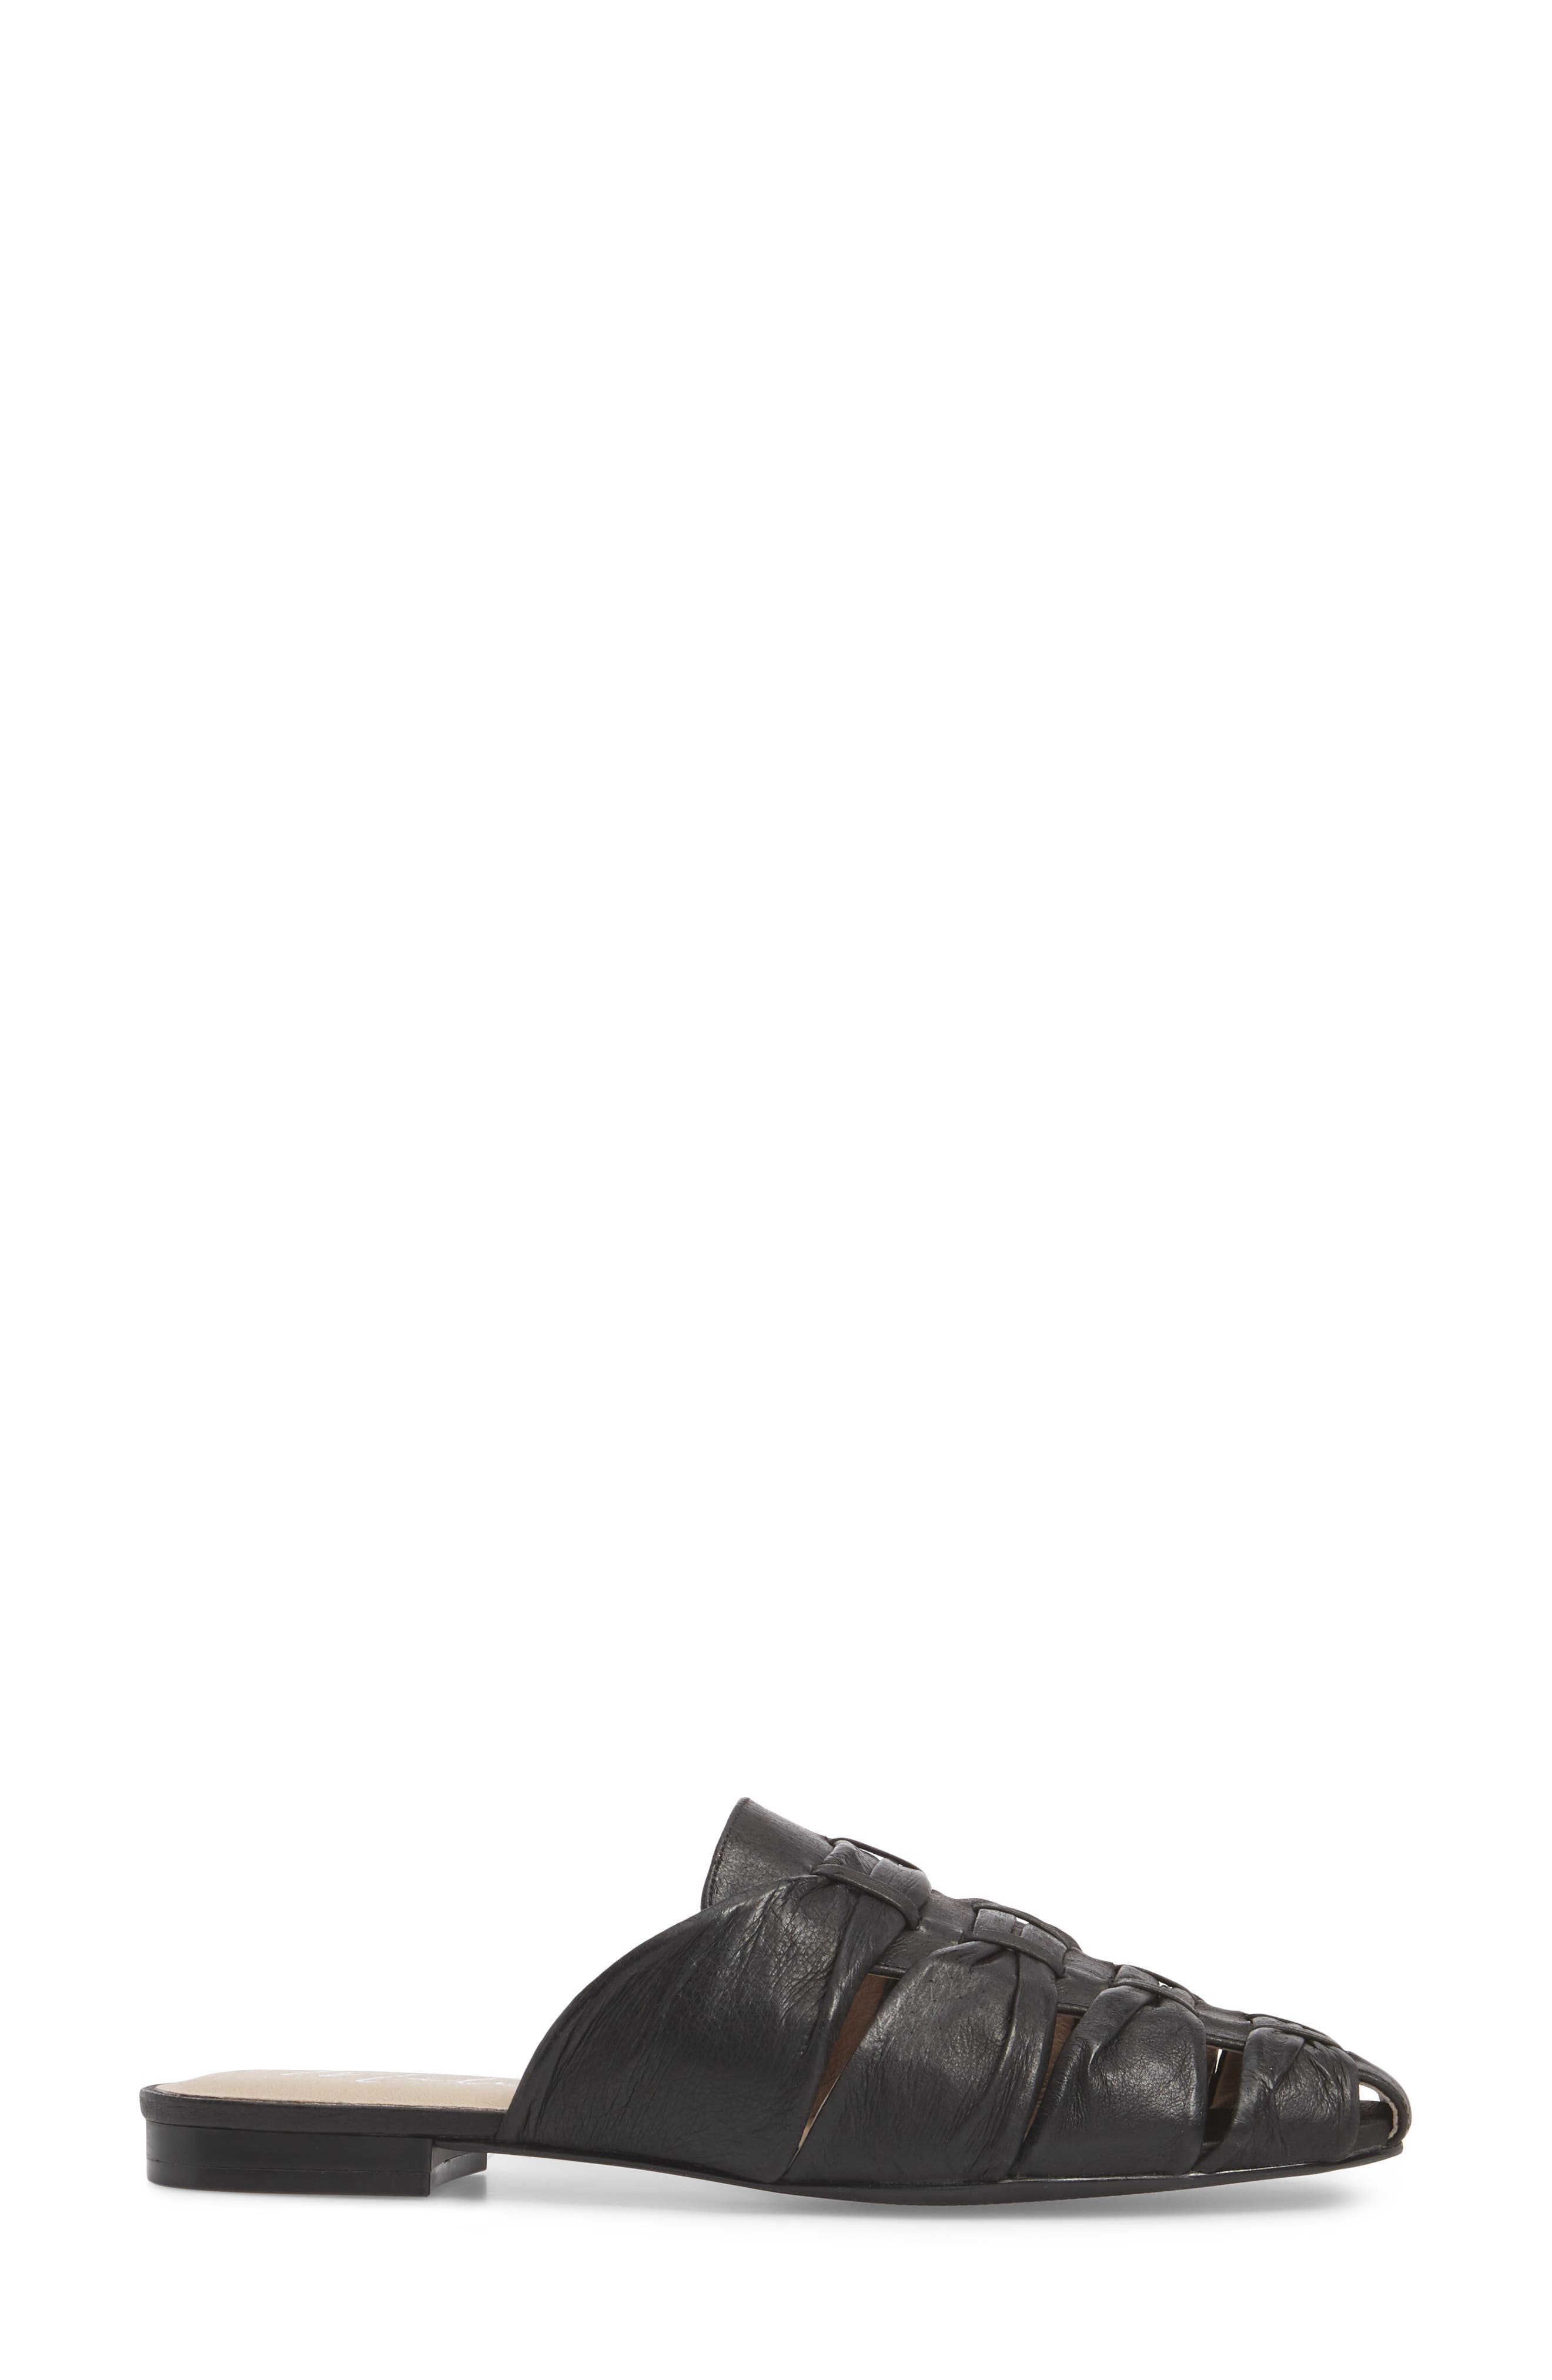 Evangeline Mule,                             Alternate thumbnail 3, color,                             Black Leather